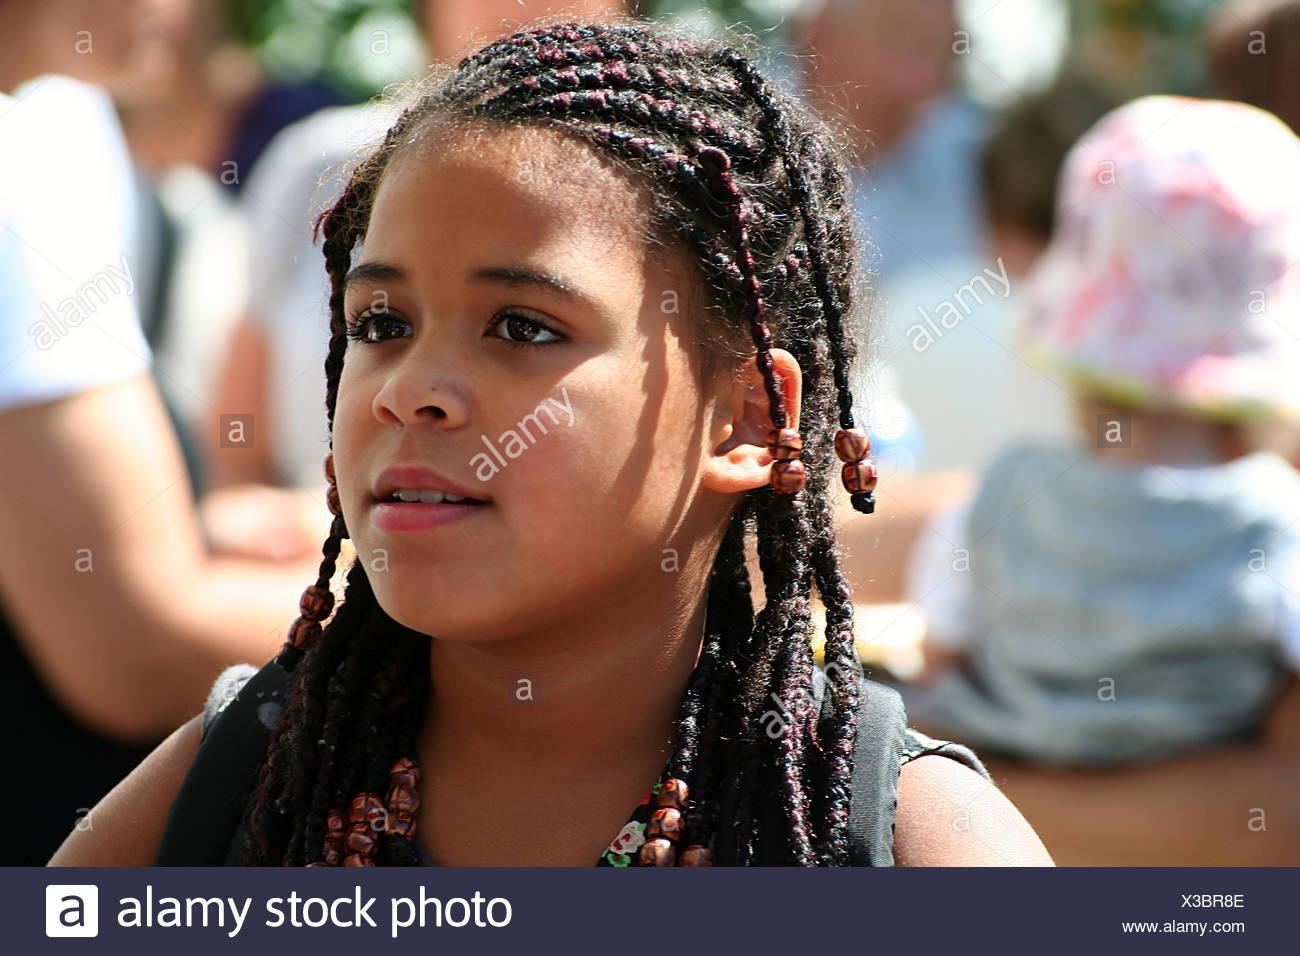 Phenomenal Teen Hairdo Plaited Braided Plaits Braids Girl Girls Teens Schematic Wiring Diagrams Phreekkolirunnerswayorg